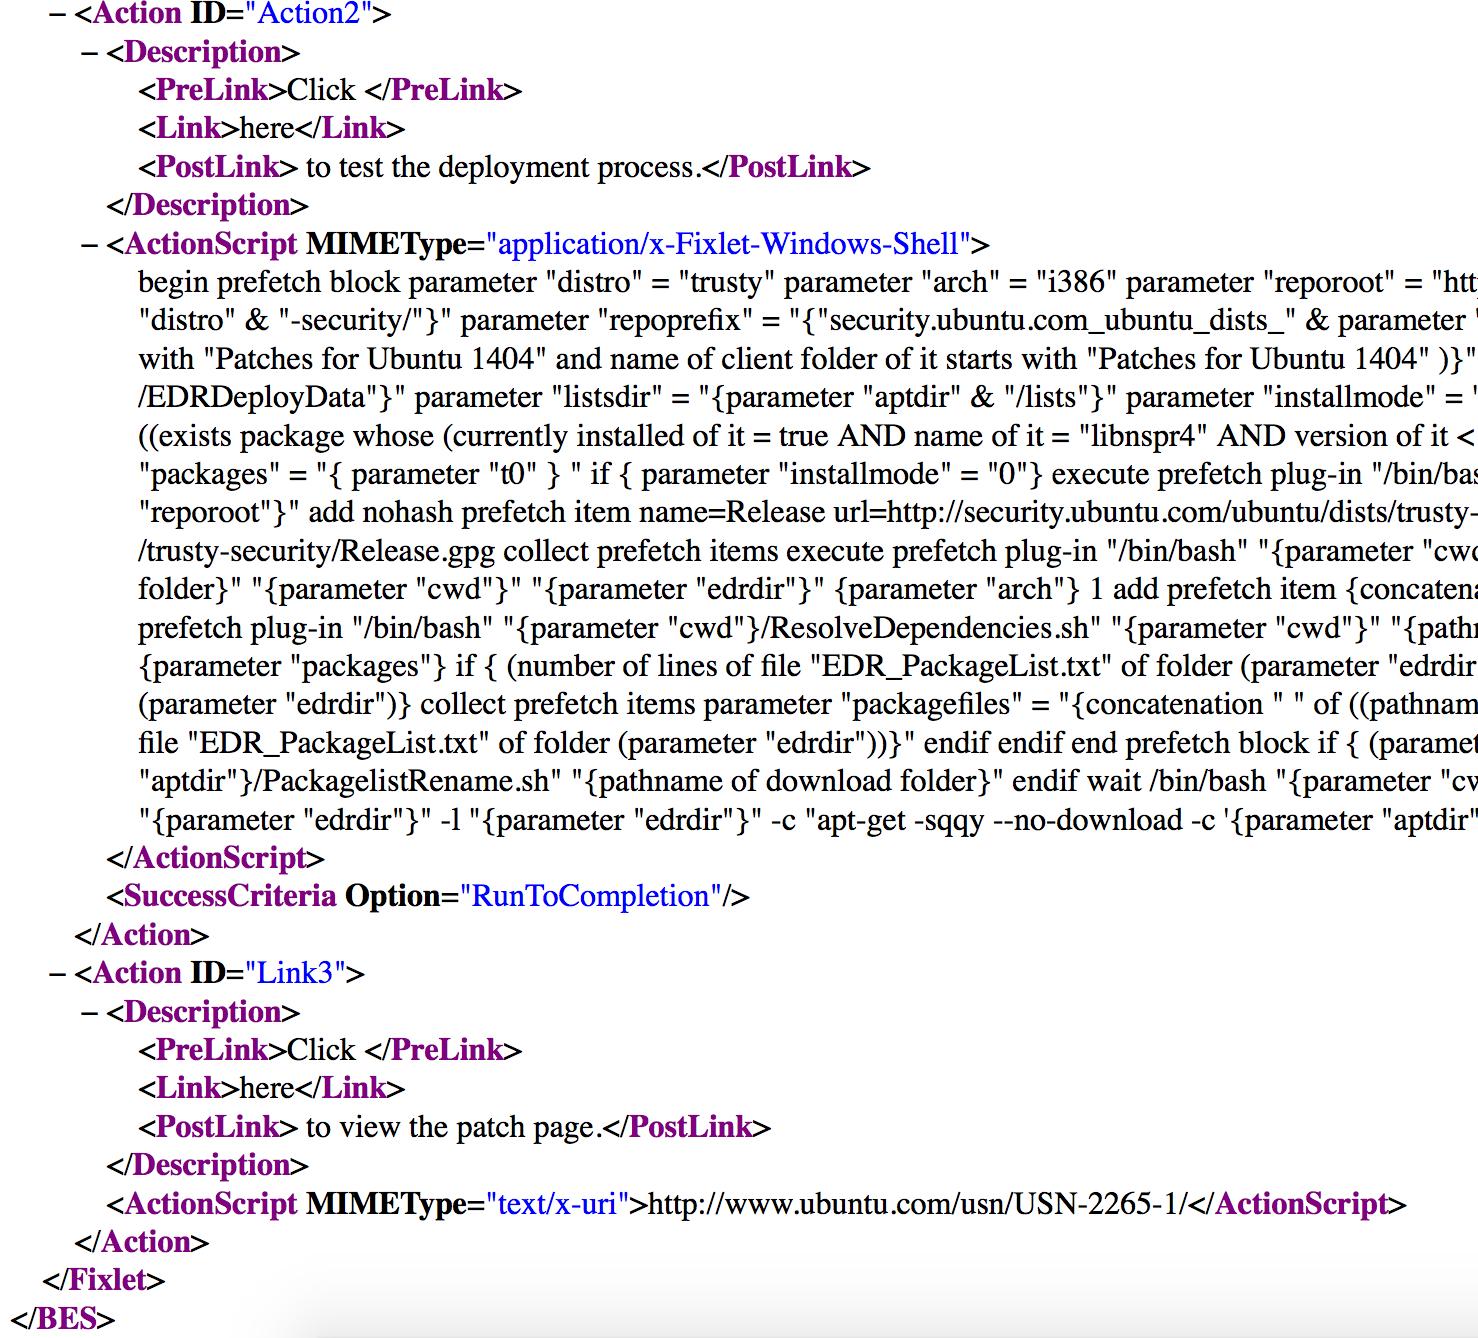 REST API Relevance Query Help to get Action item - Platform